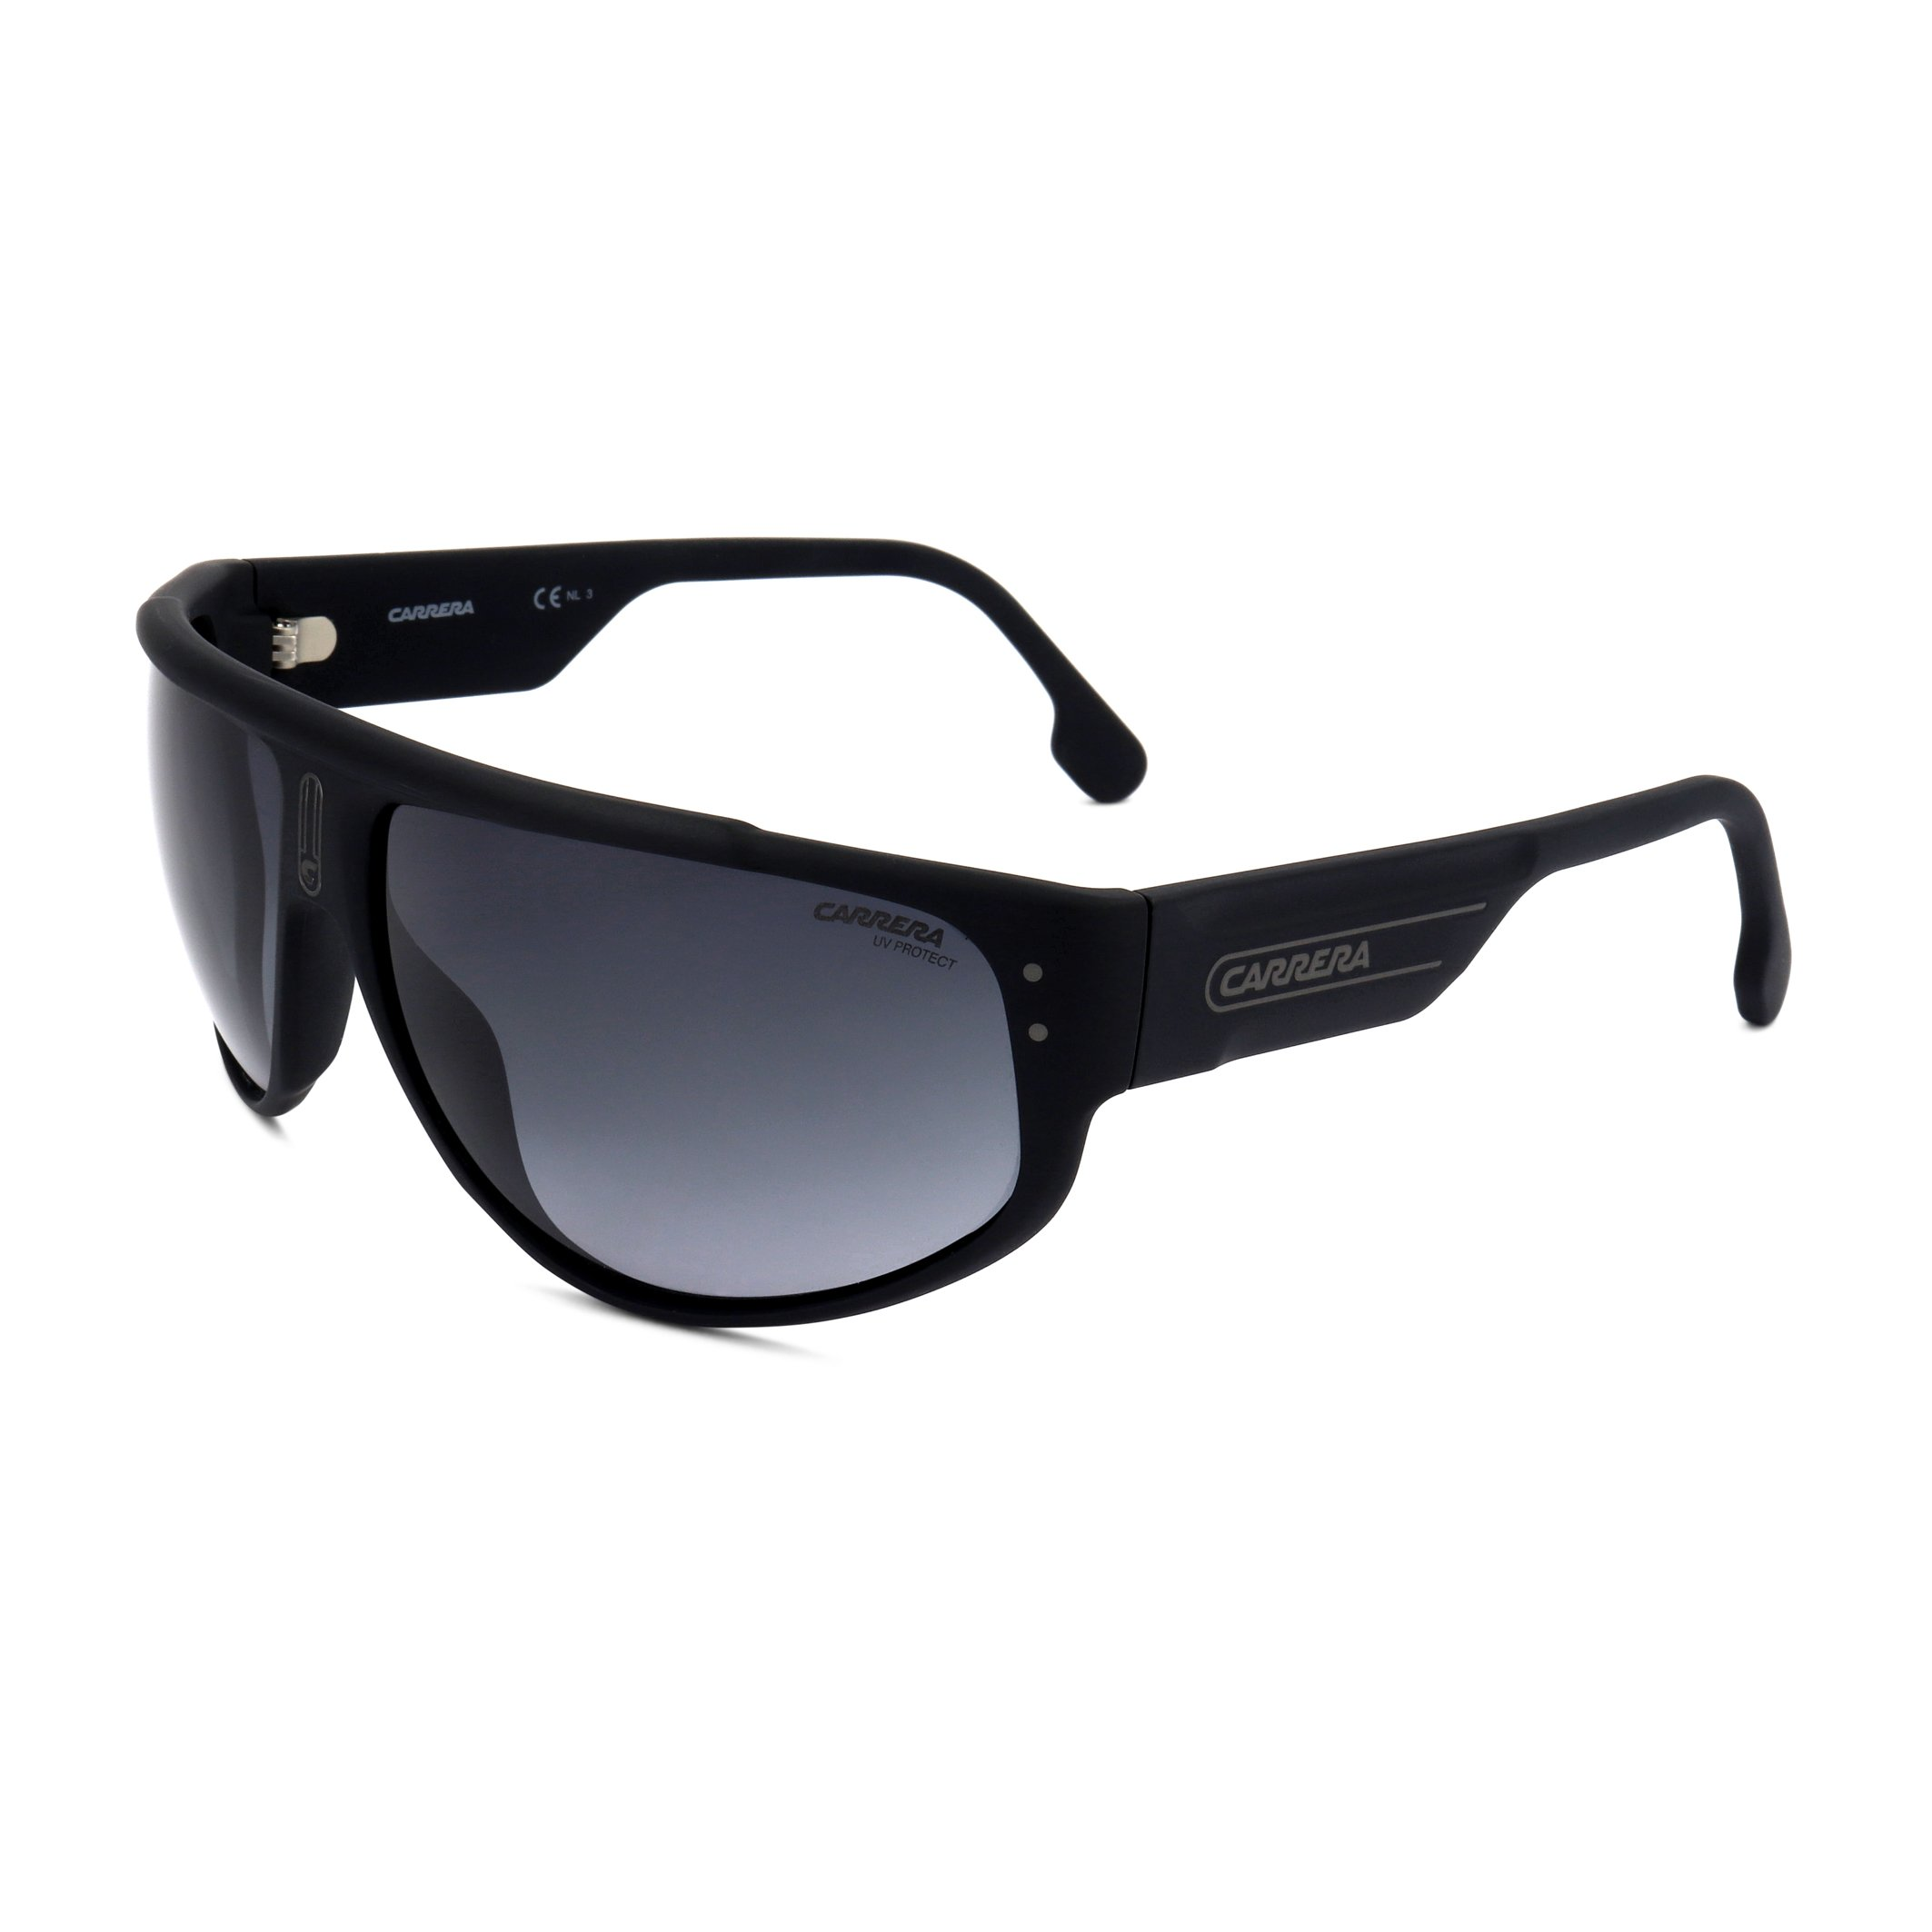 Carrera Unisex Sunglasses Black 1029S - black-2 NOSIZE